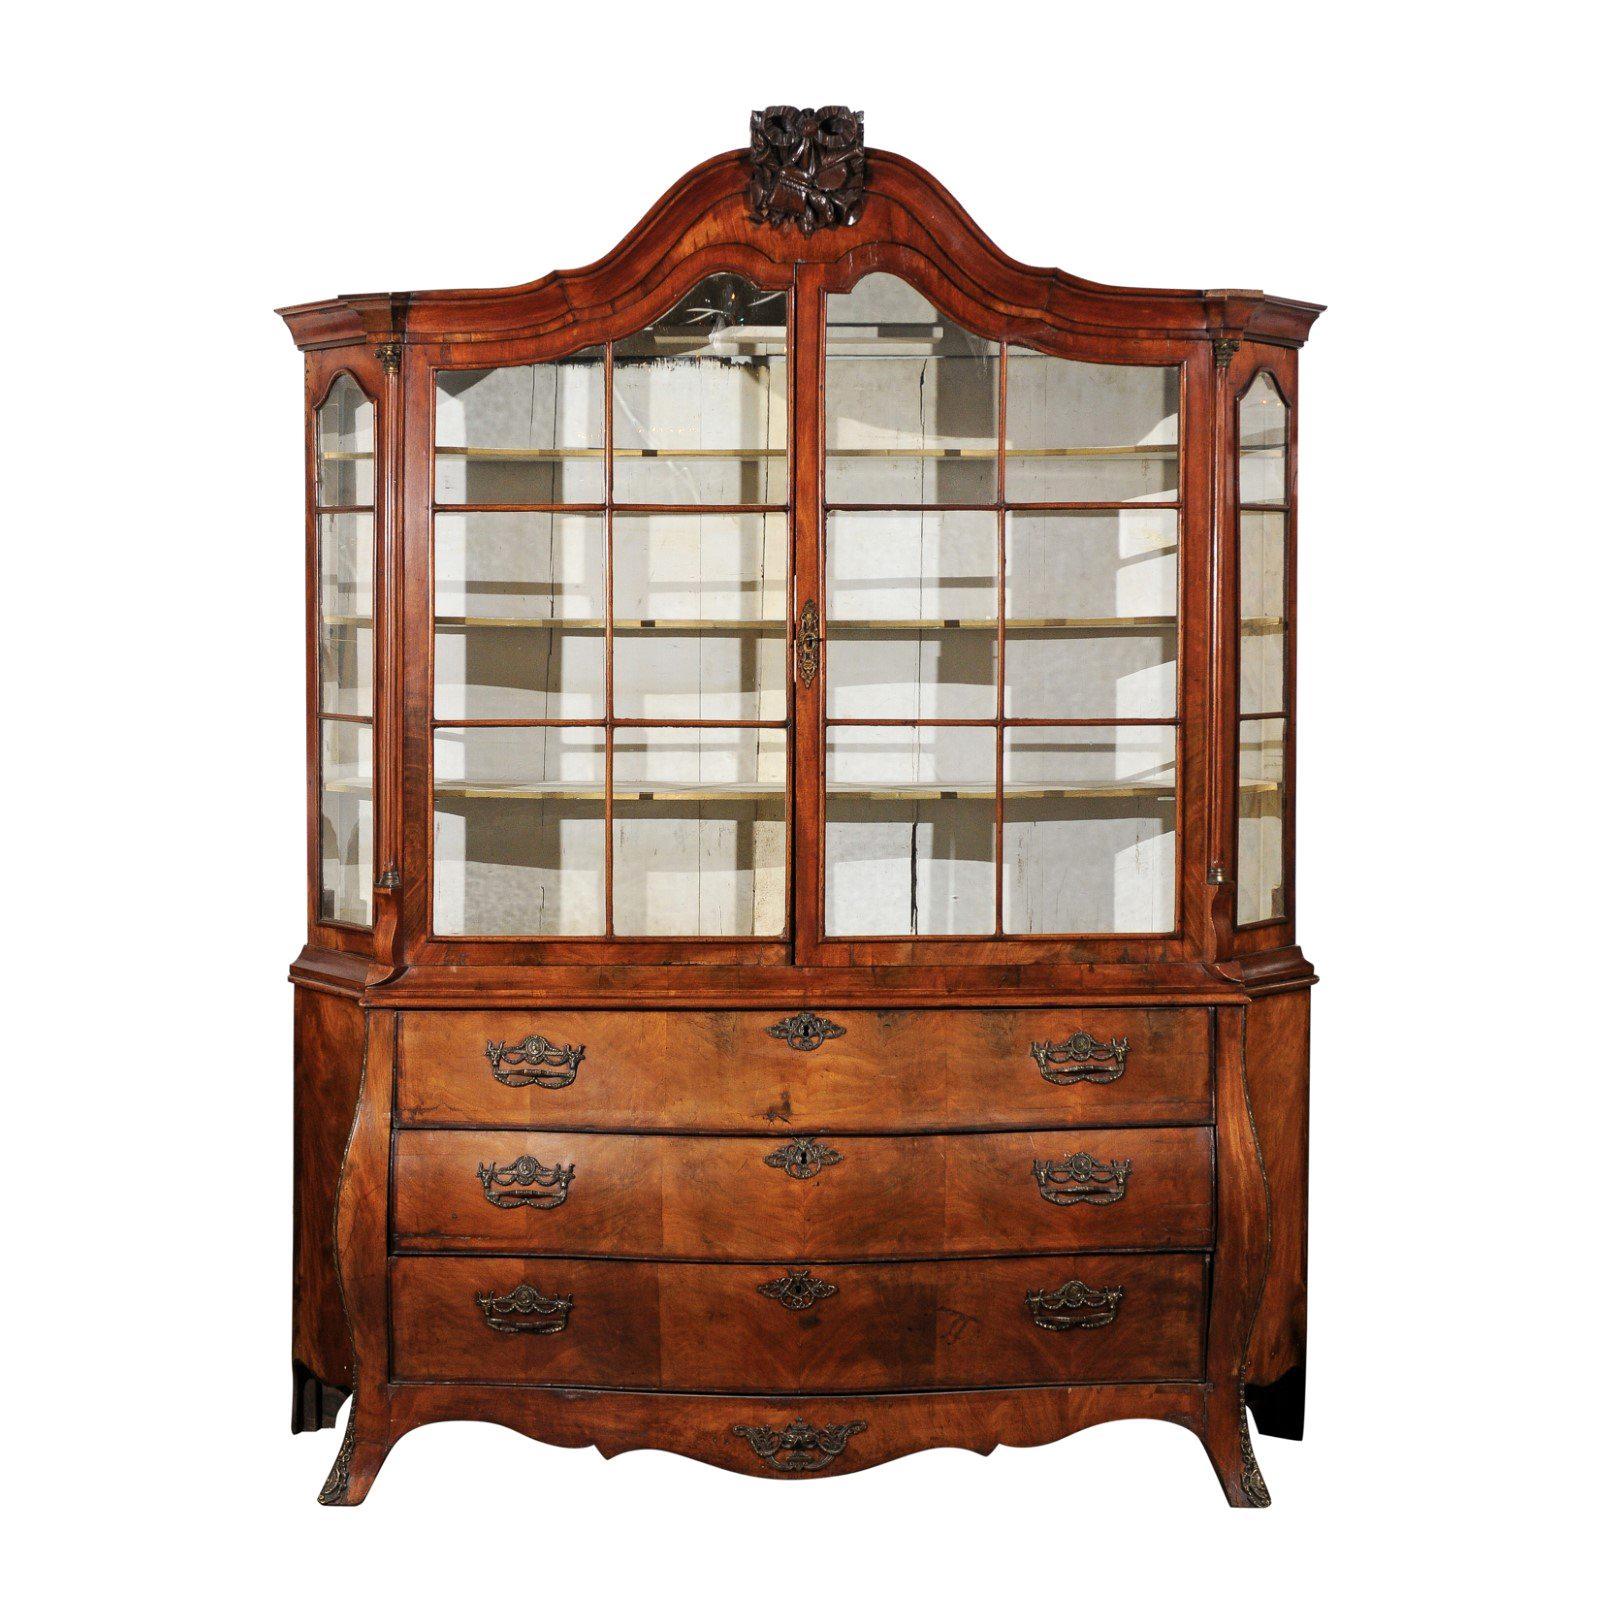 Dutch Rococo 1780s Walnut Vitrine with Bombé Chest, Glass Doors, Hunting Trophy